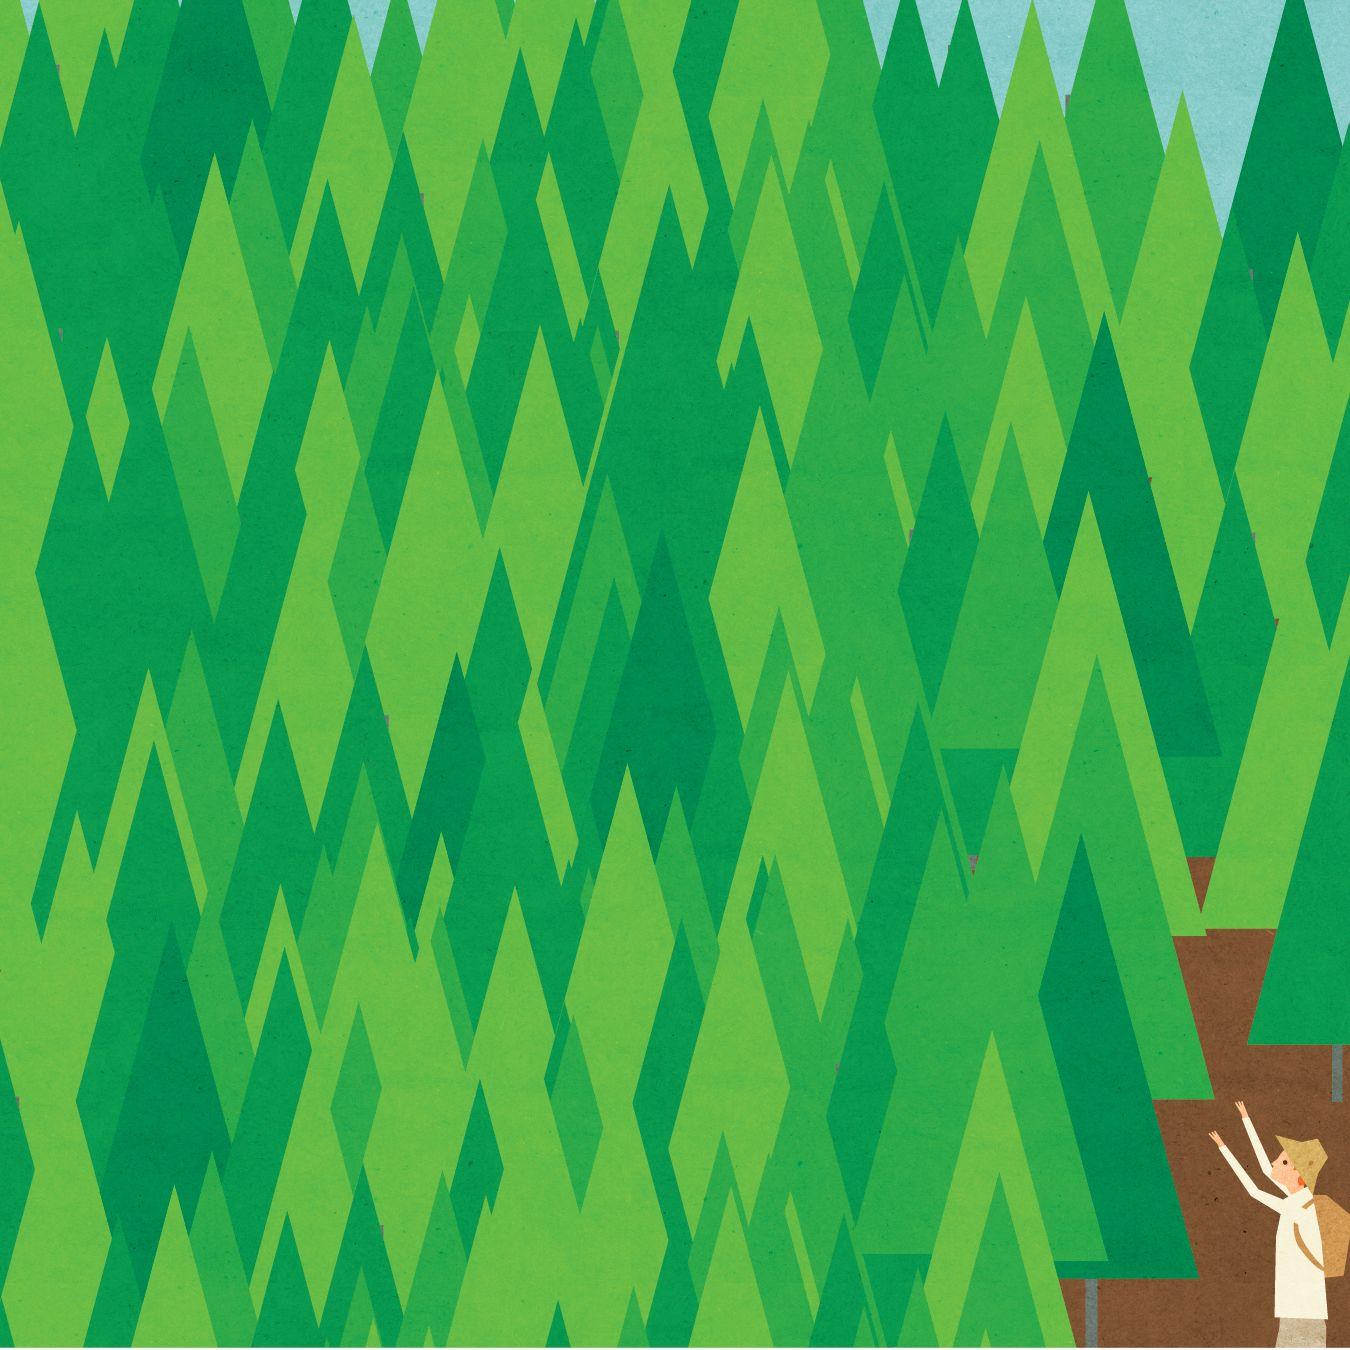 Pomo 0617 editors note forest park illustration p3te1i